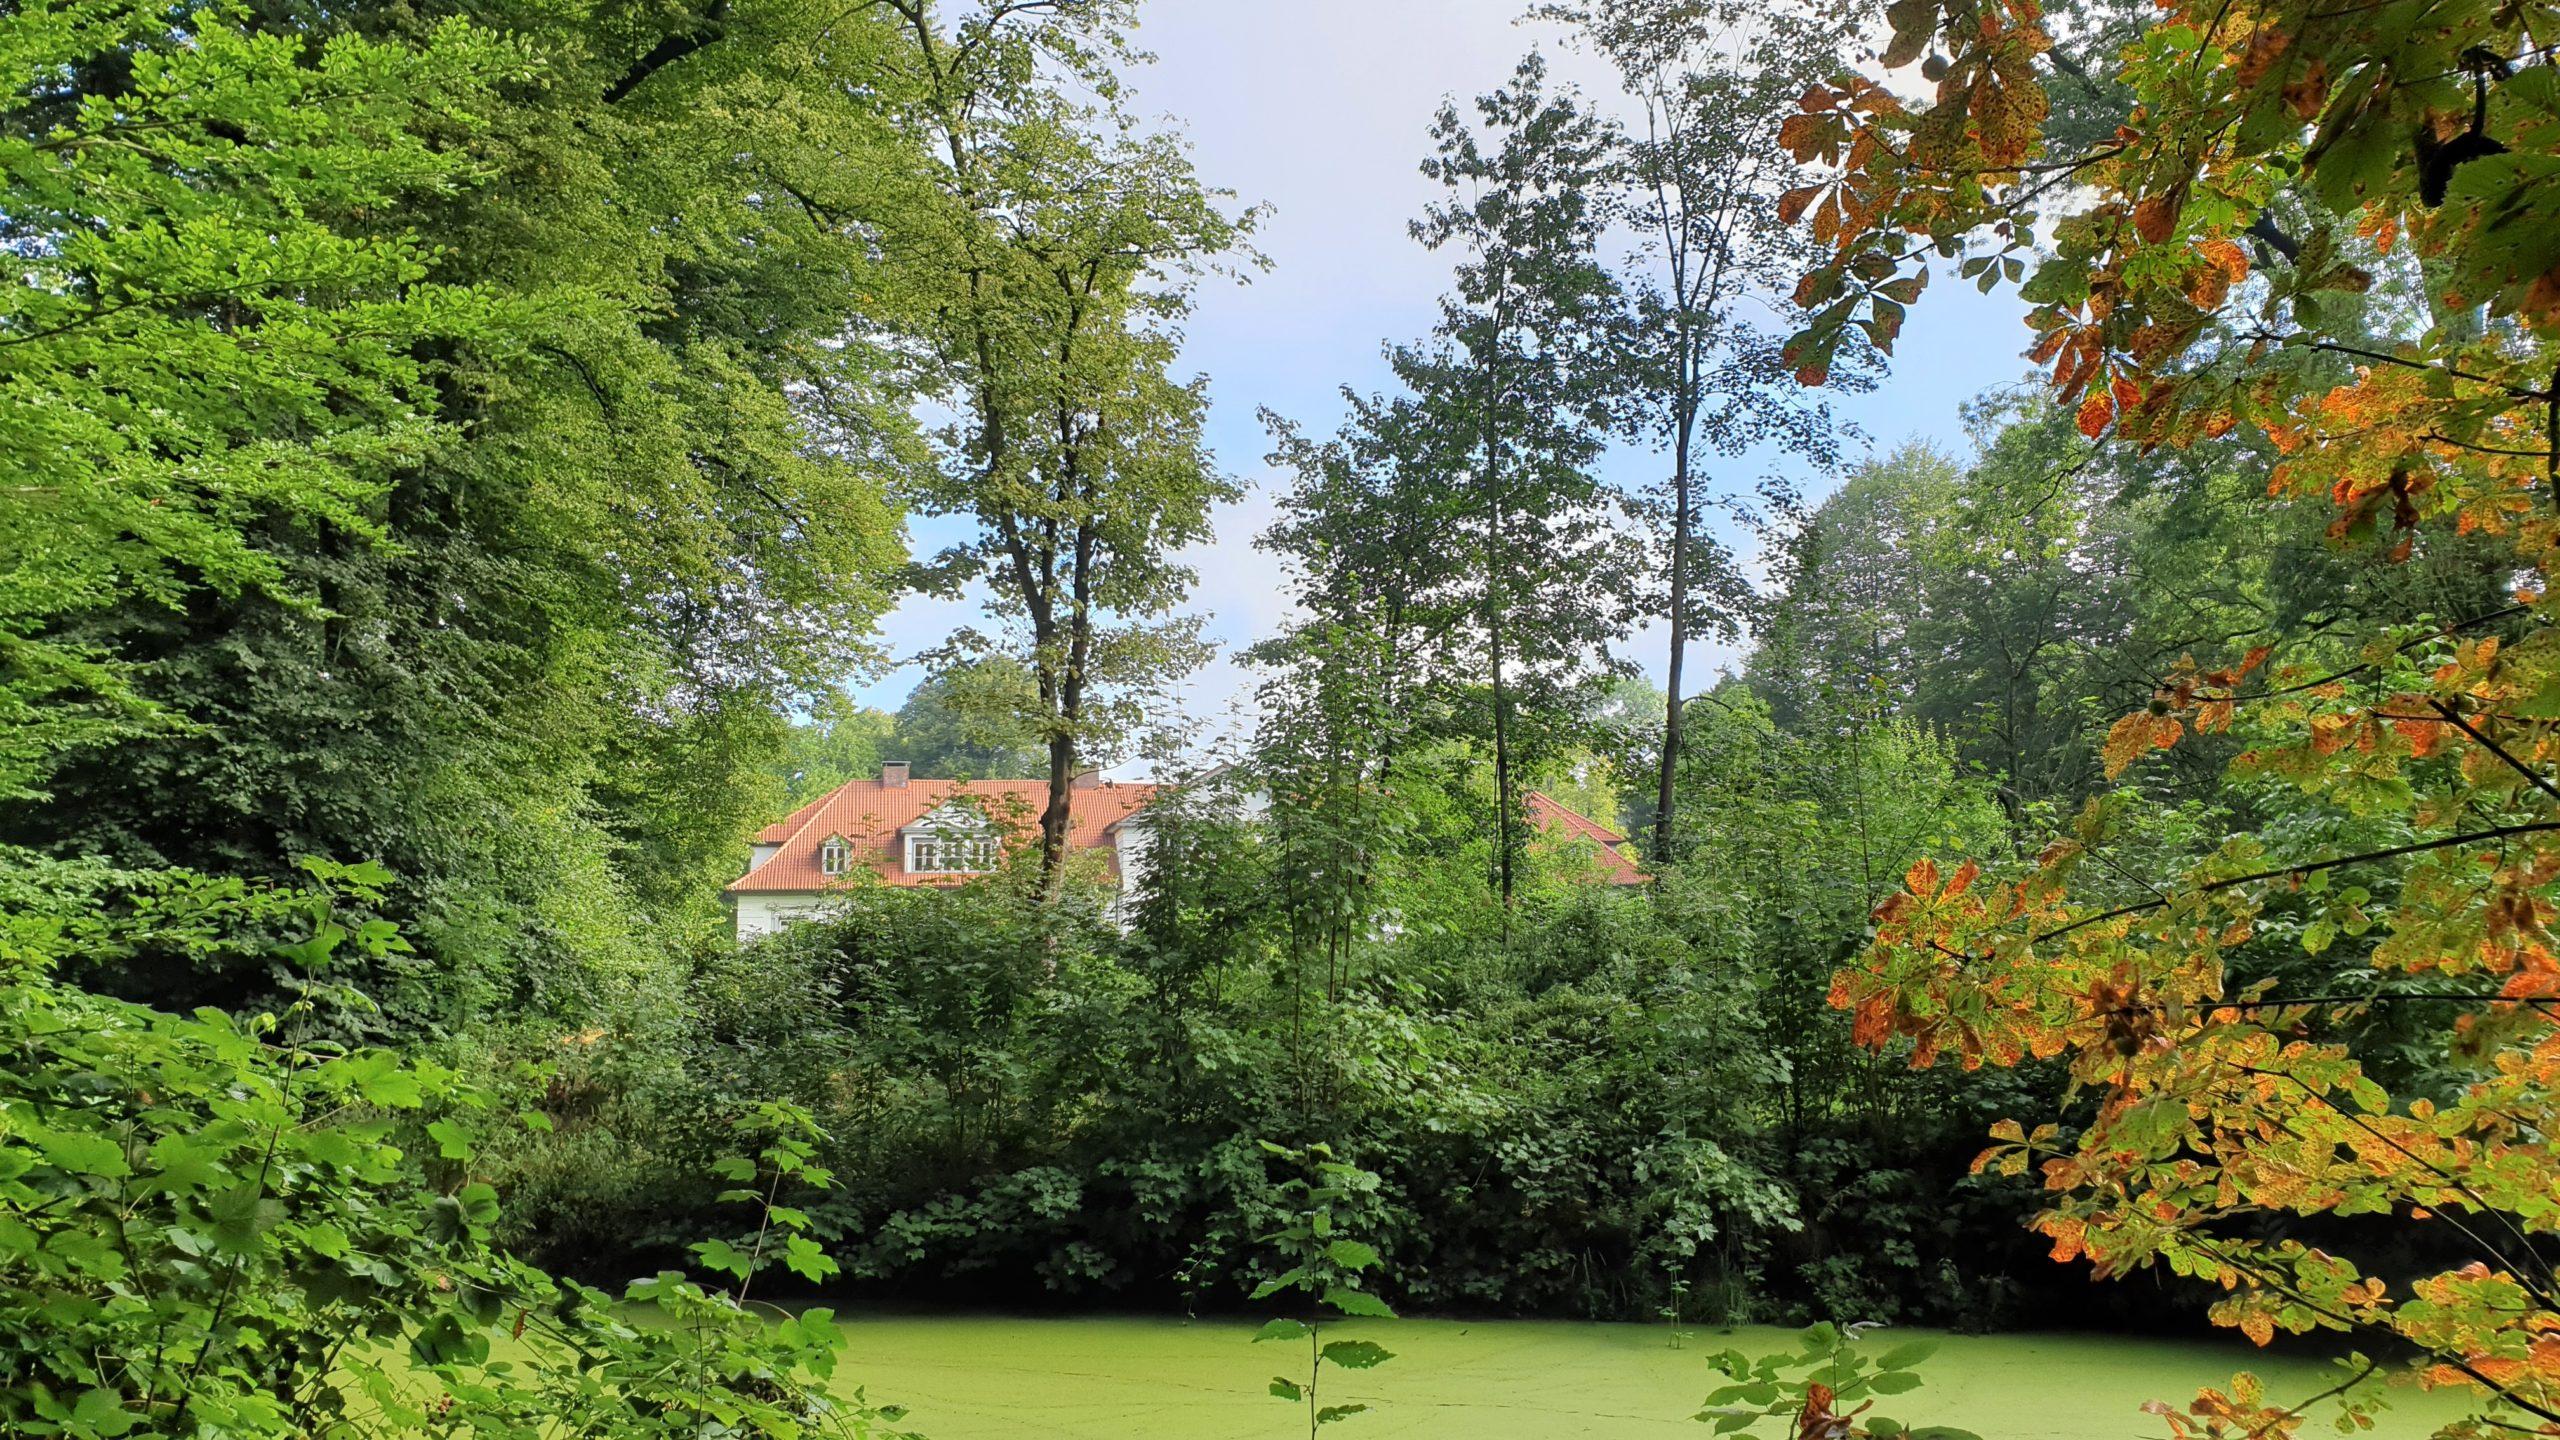 Hasseldorf Castle Park